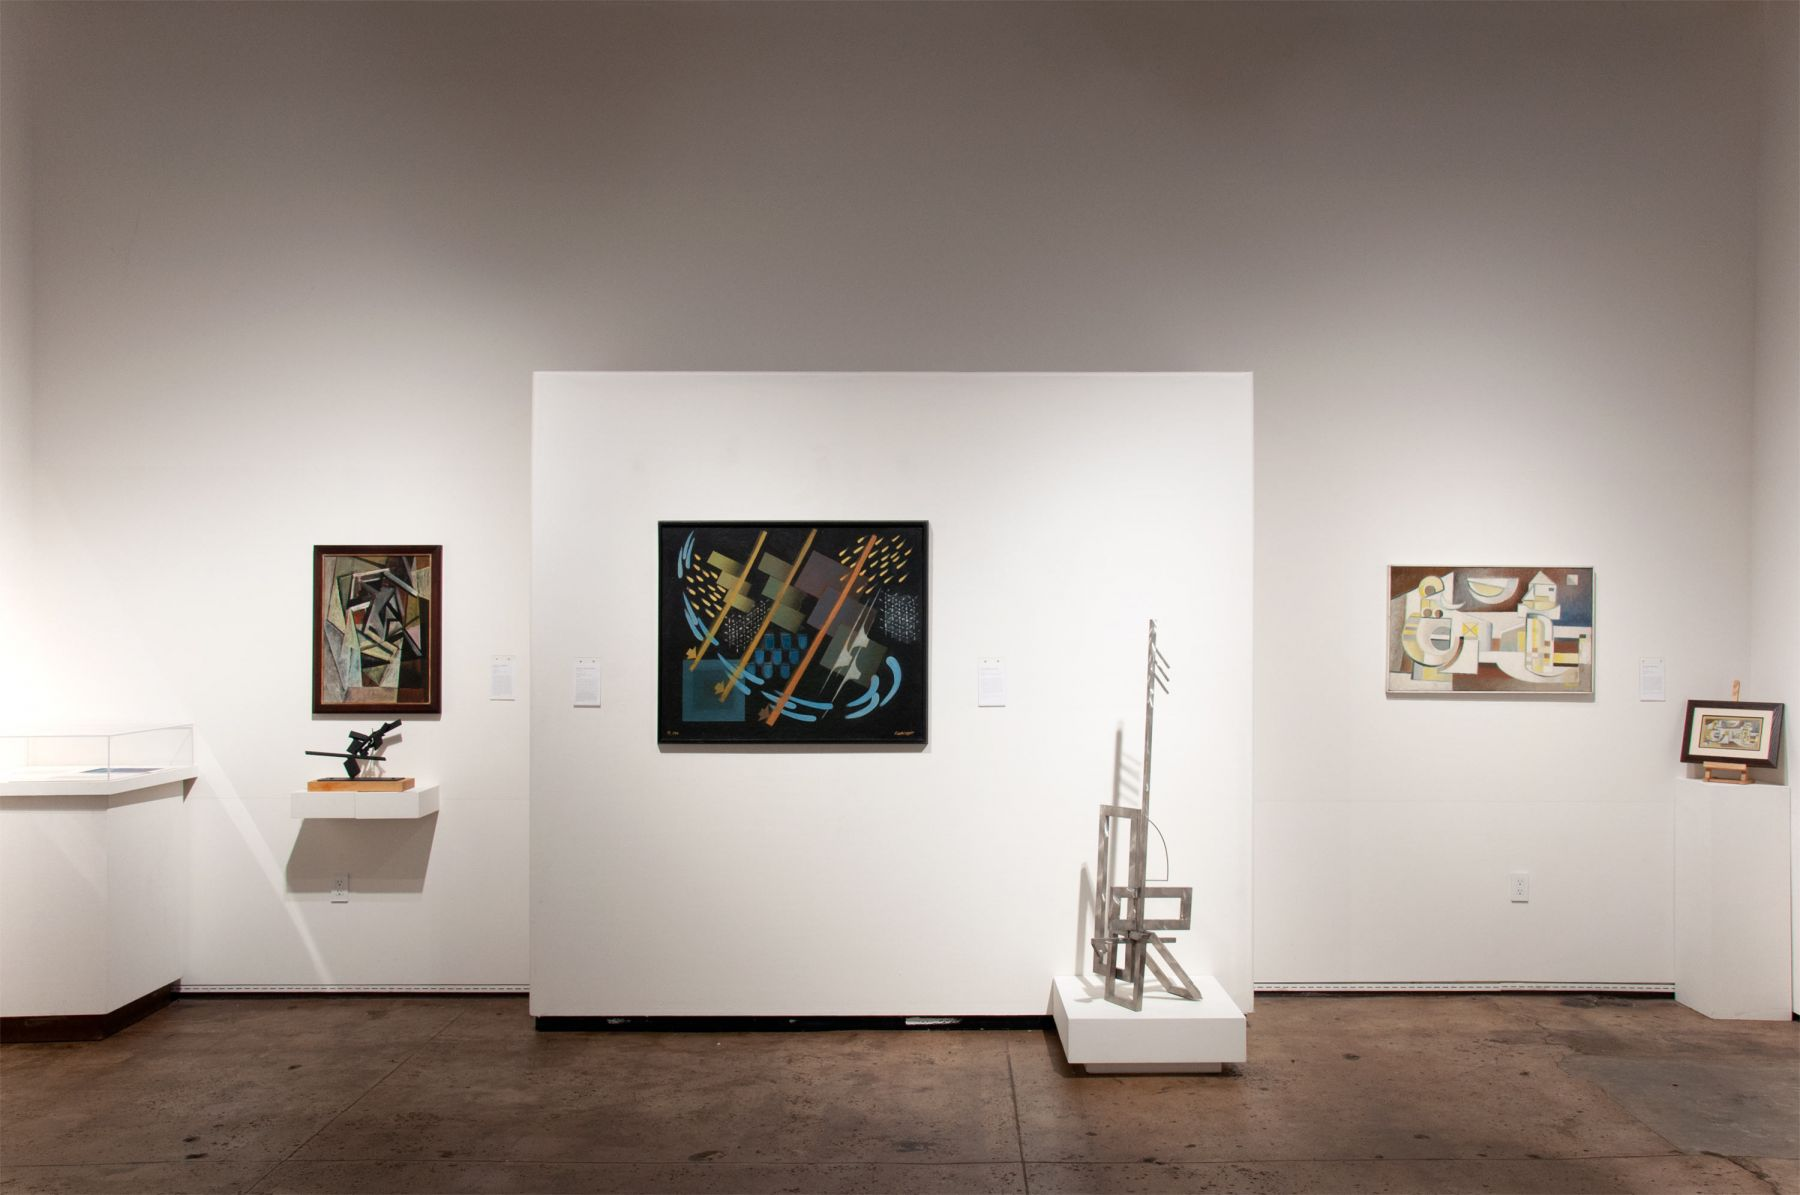 Installation photograph of CALIFORNIA BAUHAUS with Sidney Gordin, Oskar Fischinger, Ken Bortolazzo, and Werner Drewes